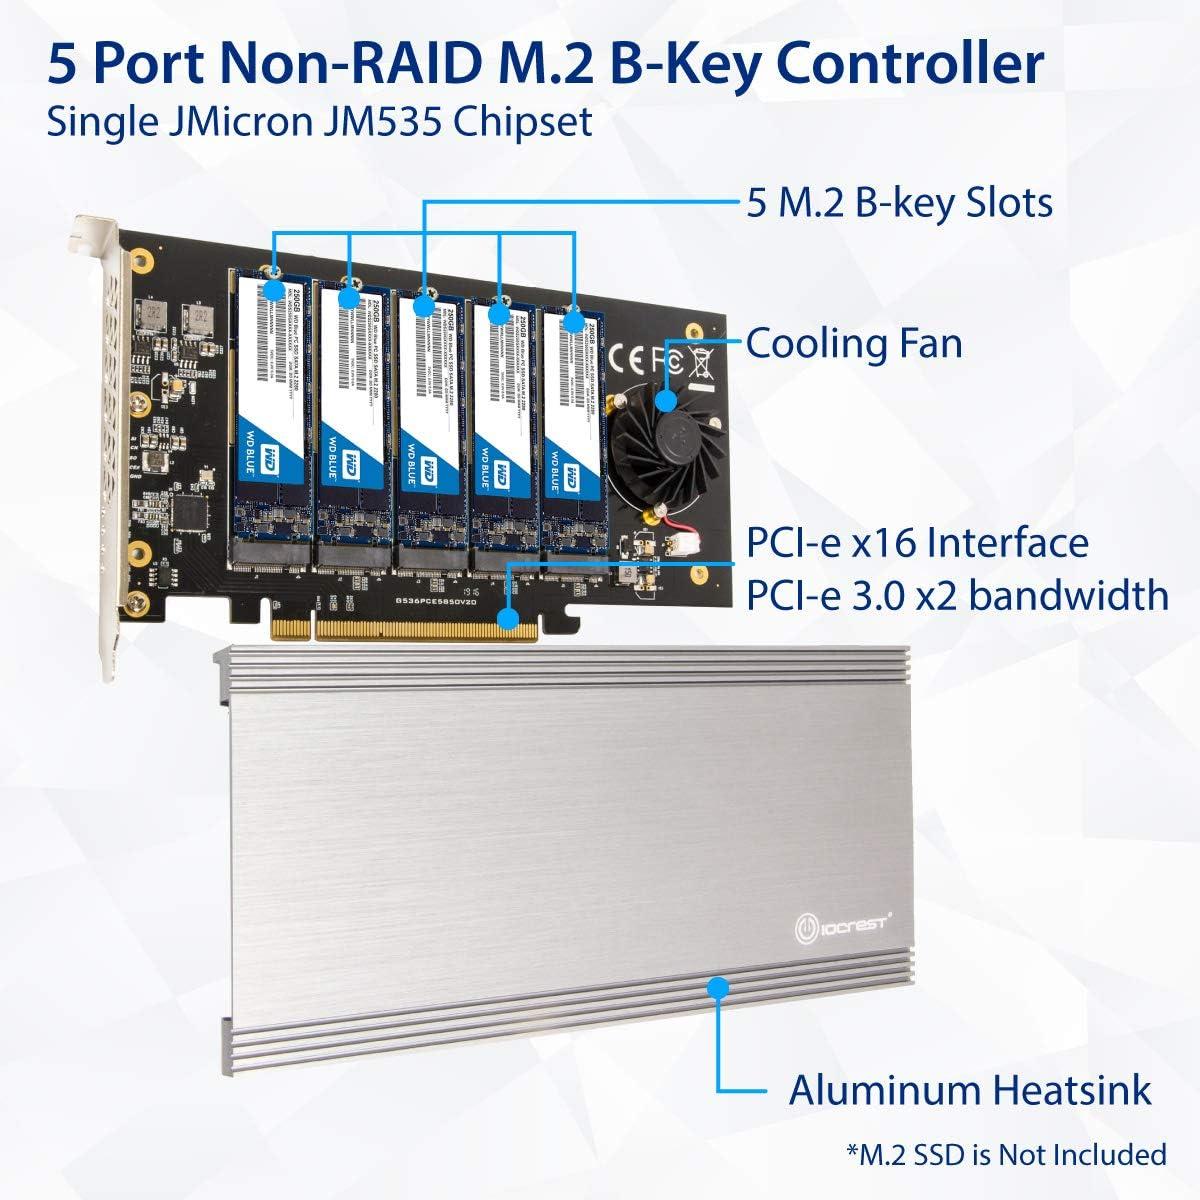 IO CREST 5 Slot M.2 B-Key SATA Base Pci-E 3.0 X2 Bandwidth Non-Raid Controller Card Require X16 Slot